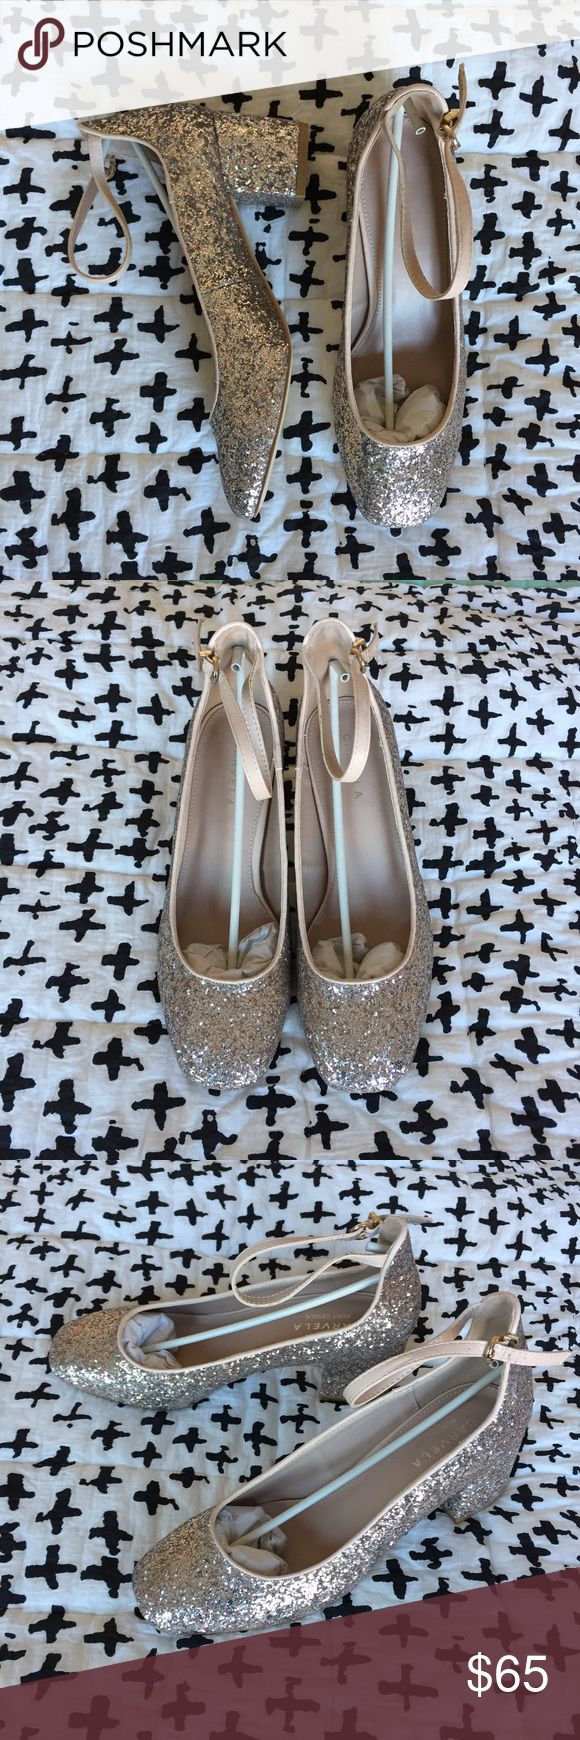 NIB Kurt Geiger Carvela Nude Glitter Mid-Heel sz39 Stunning mid-height heels from Kurt Geiger UK.  Slightly too big on me (I usually wear US 8). Never worn! Shipped with box. ASOS Shoes Heels